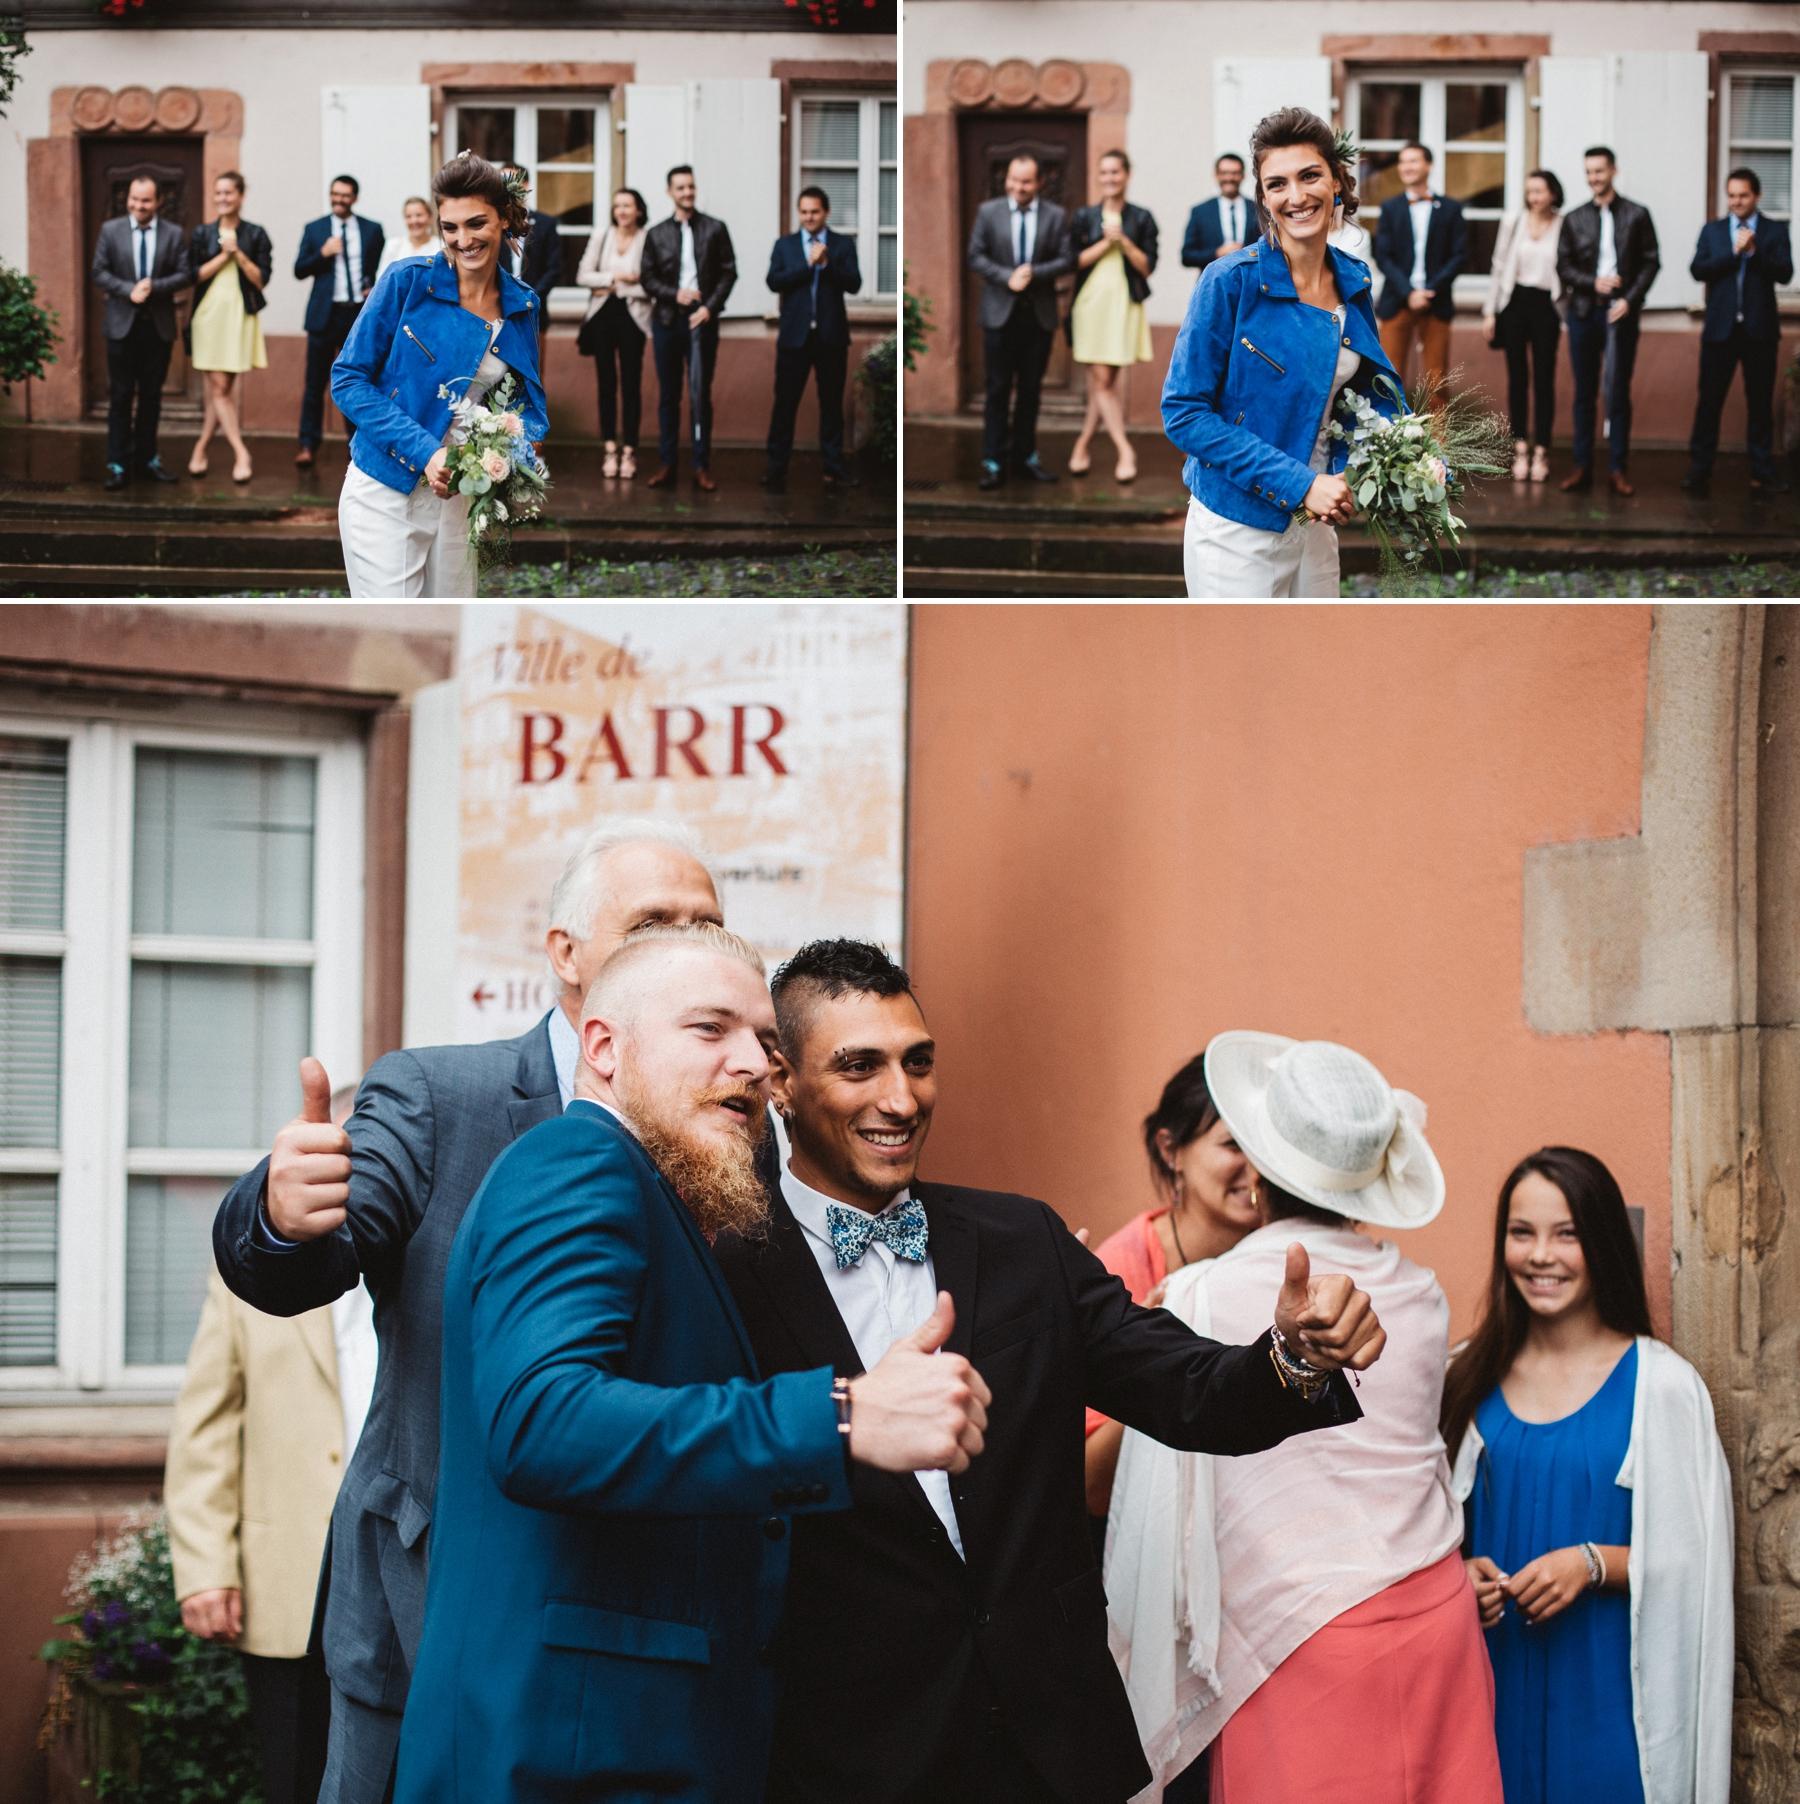 mariage-relais-gensbourg-raphaelmelka-11.jpg